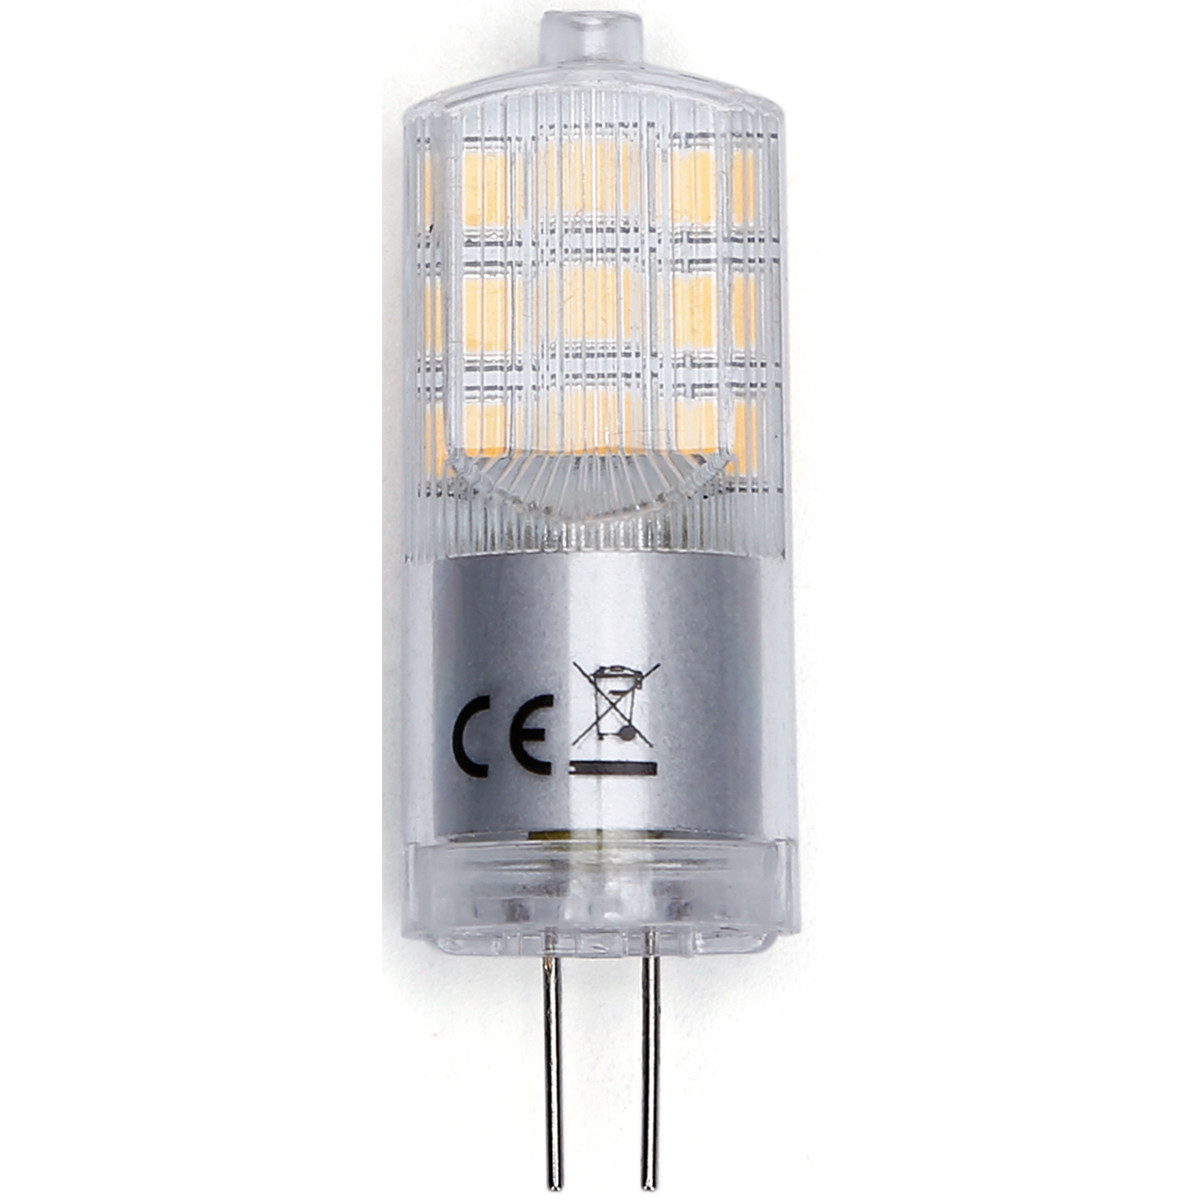 LED Lamp - Aigi - G4 Fitting - 3W - Helder/Koud Wit 6500K | Vervangt 25W